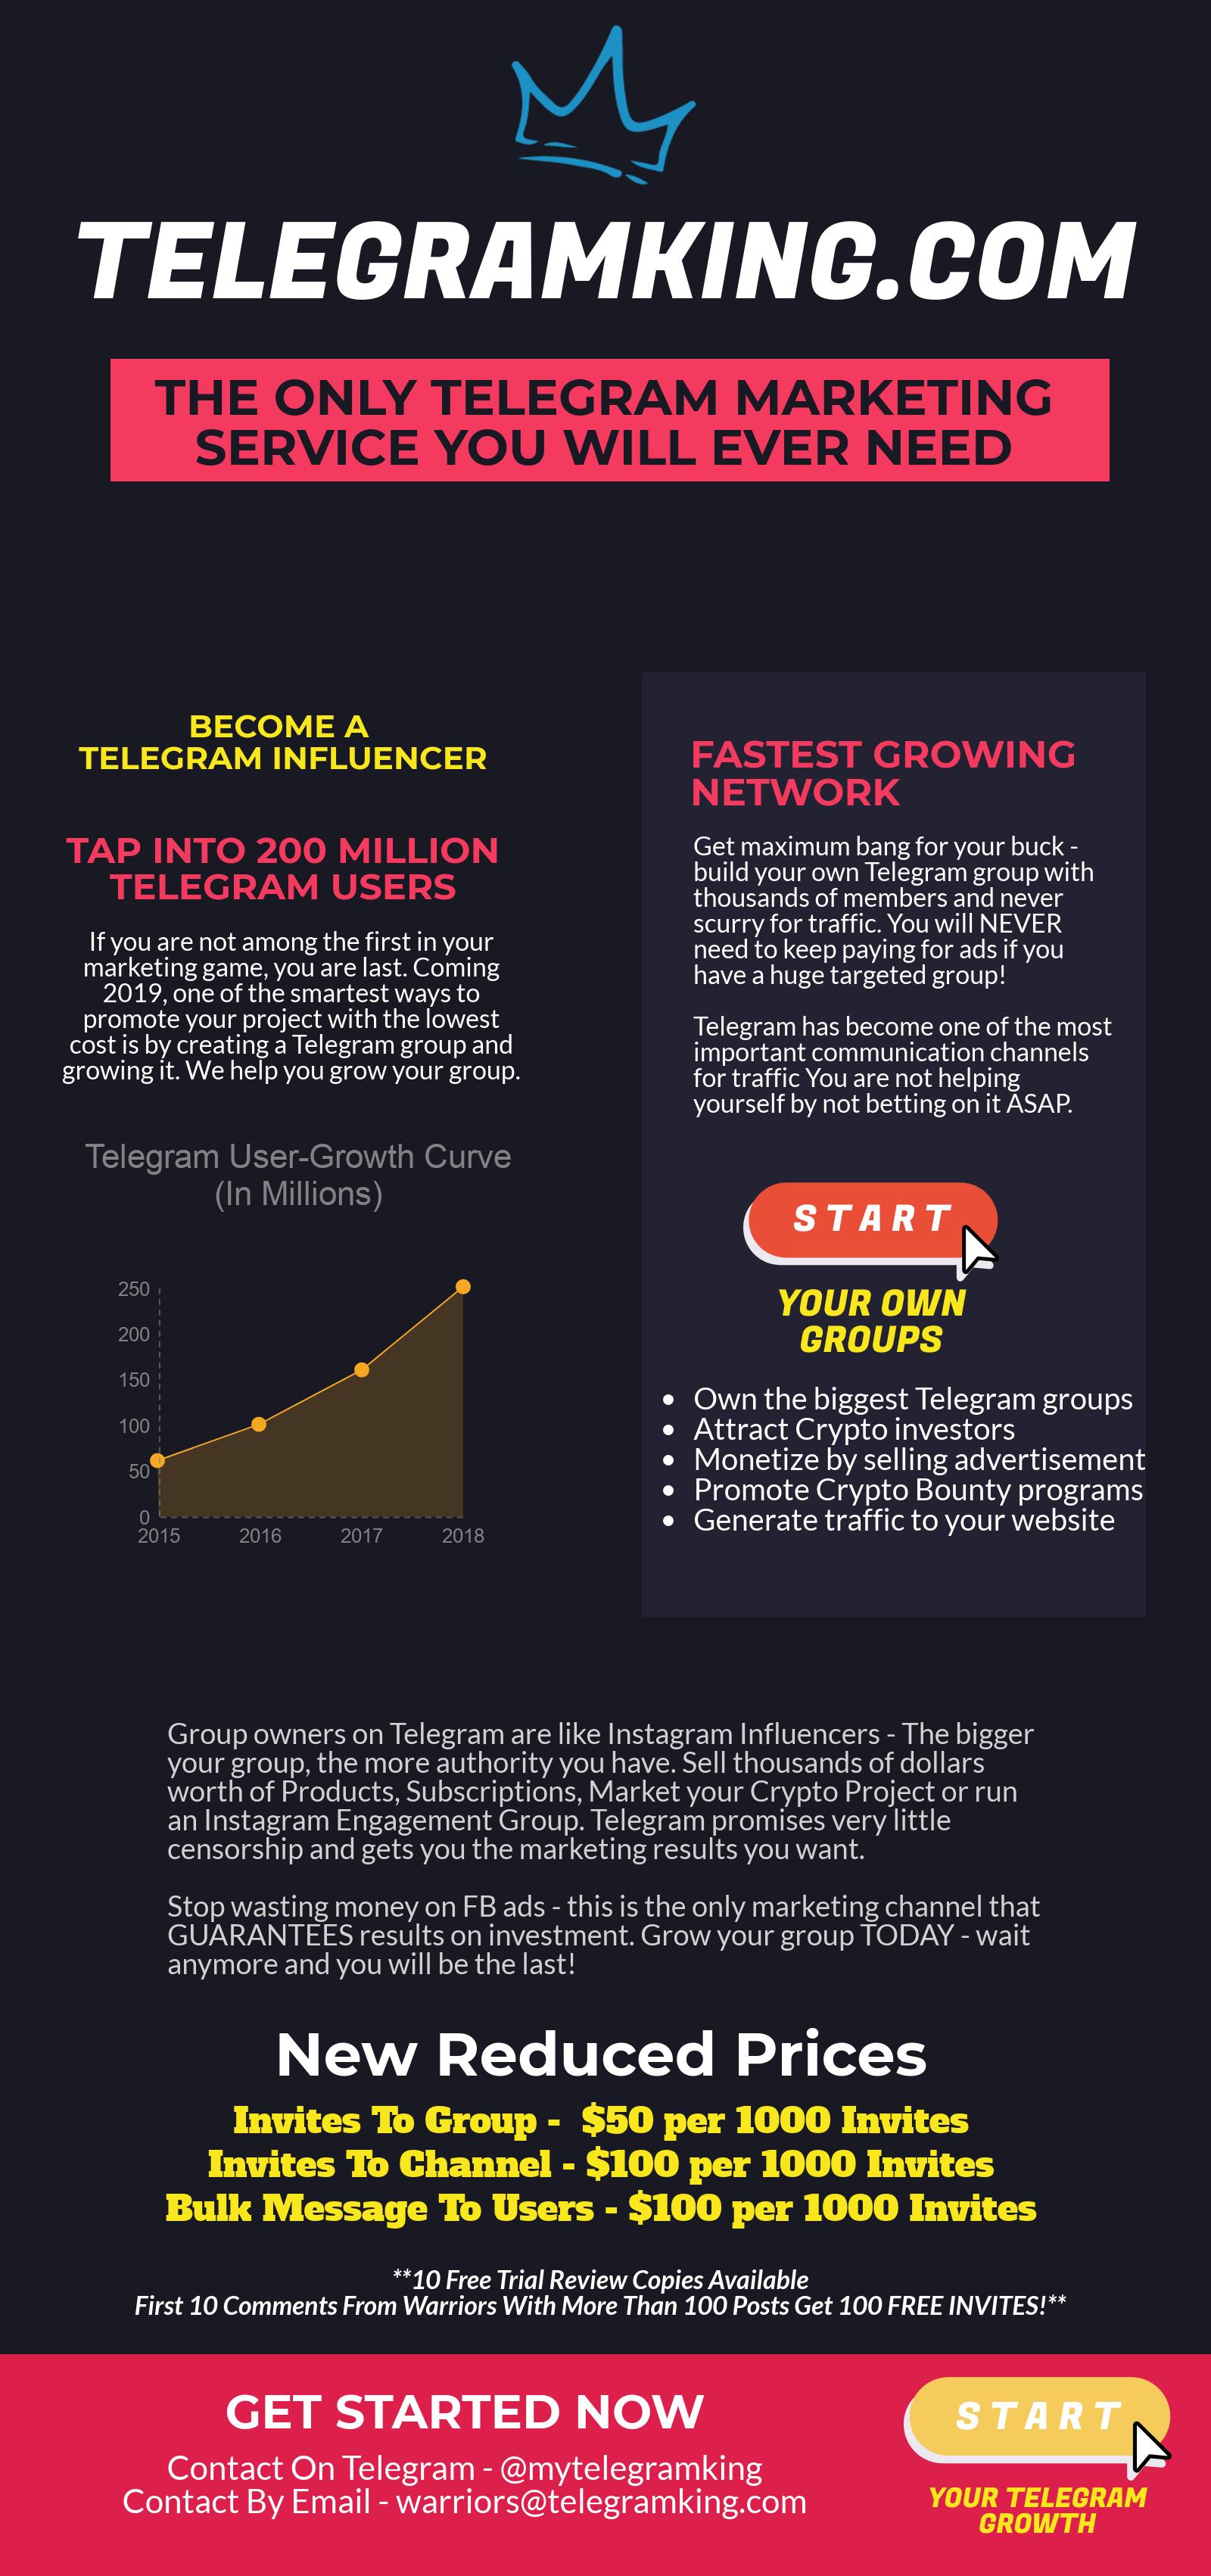 TELEGRAM KING Marketing Services - Build Your Own Telegram Groups